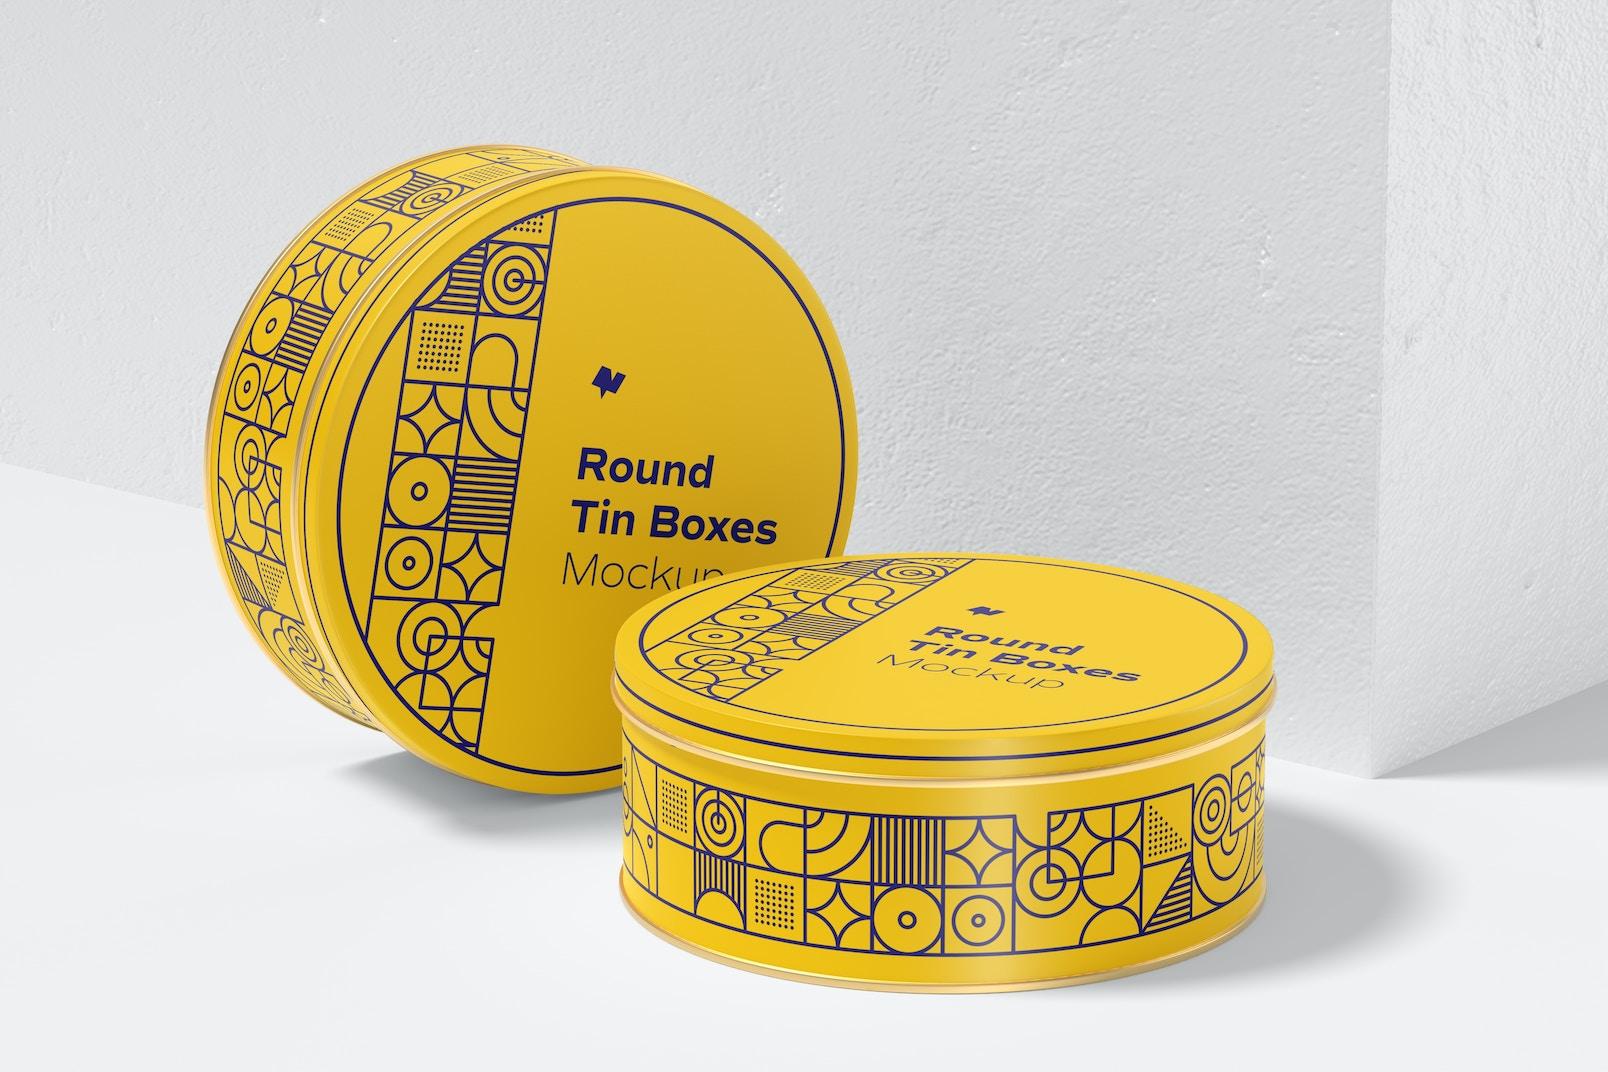 Round Tin Box Mockup, Right View